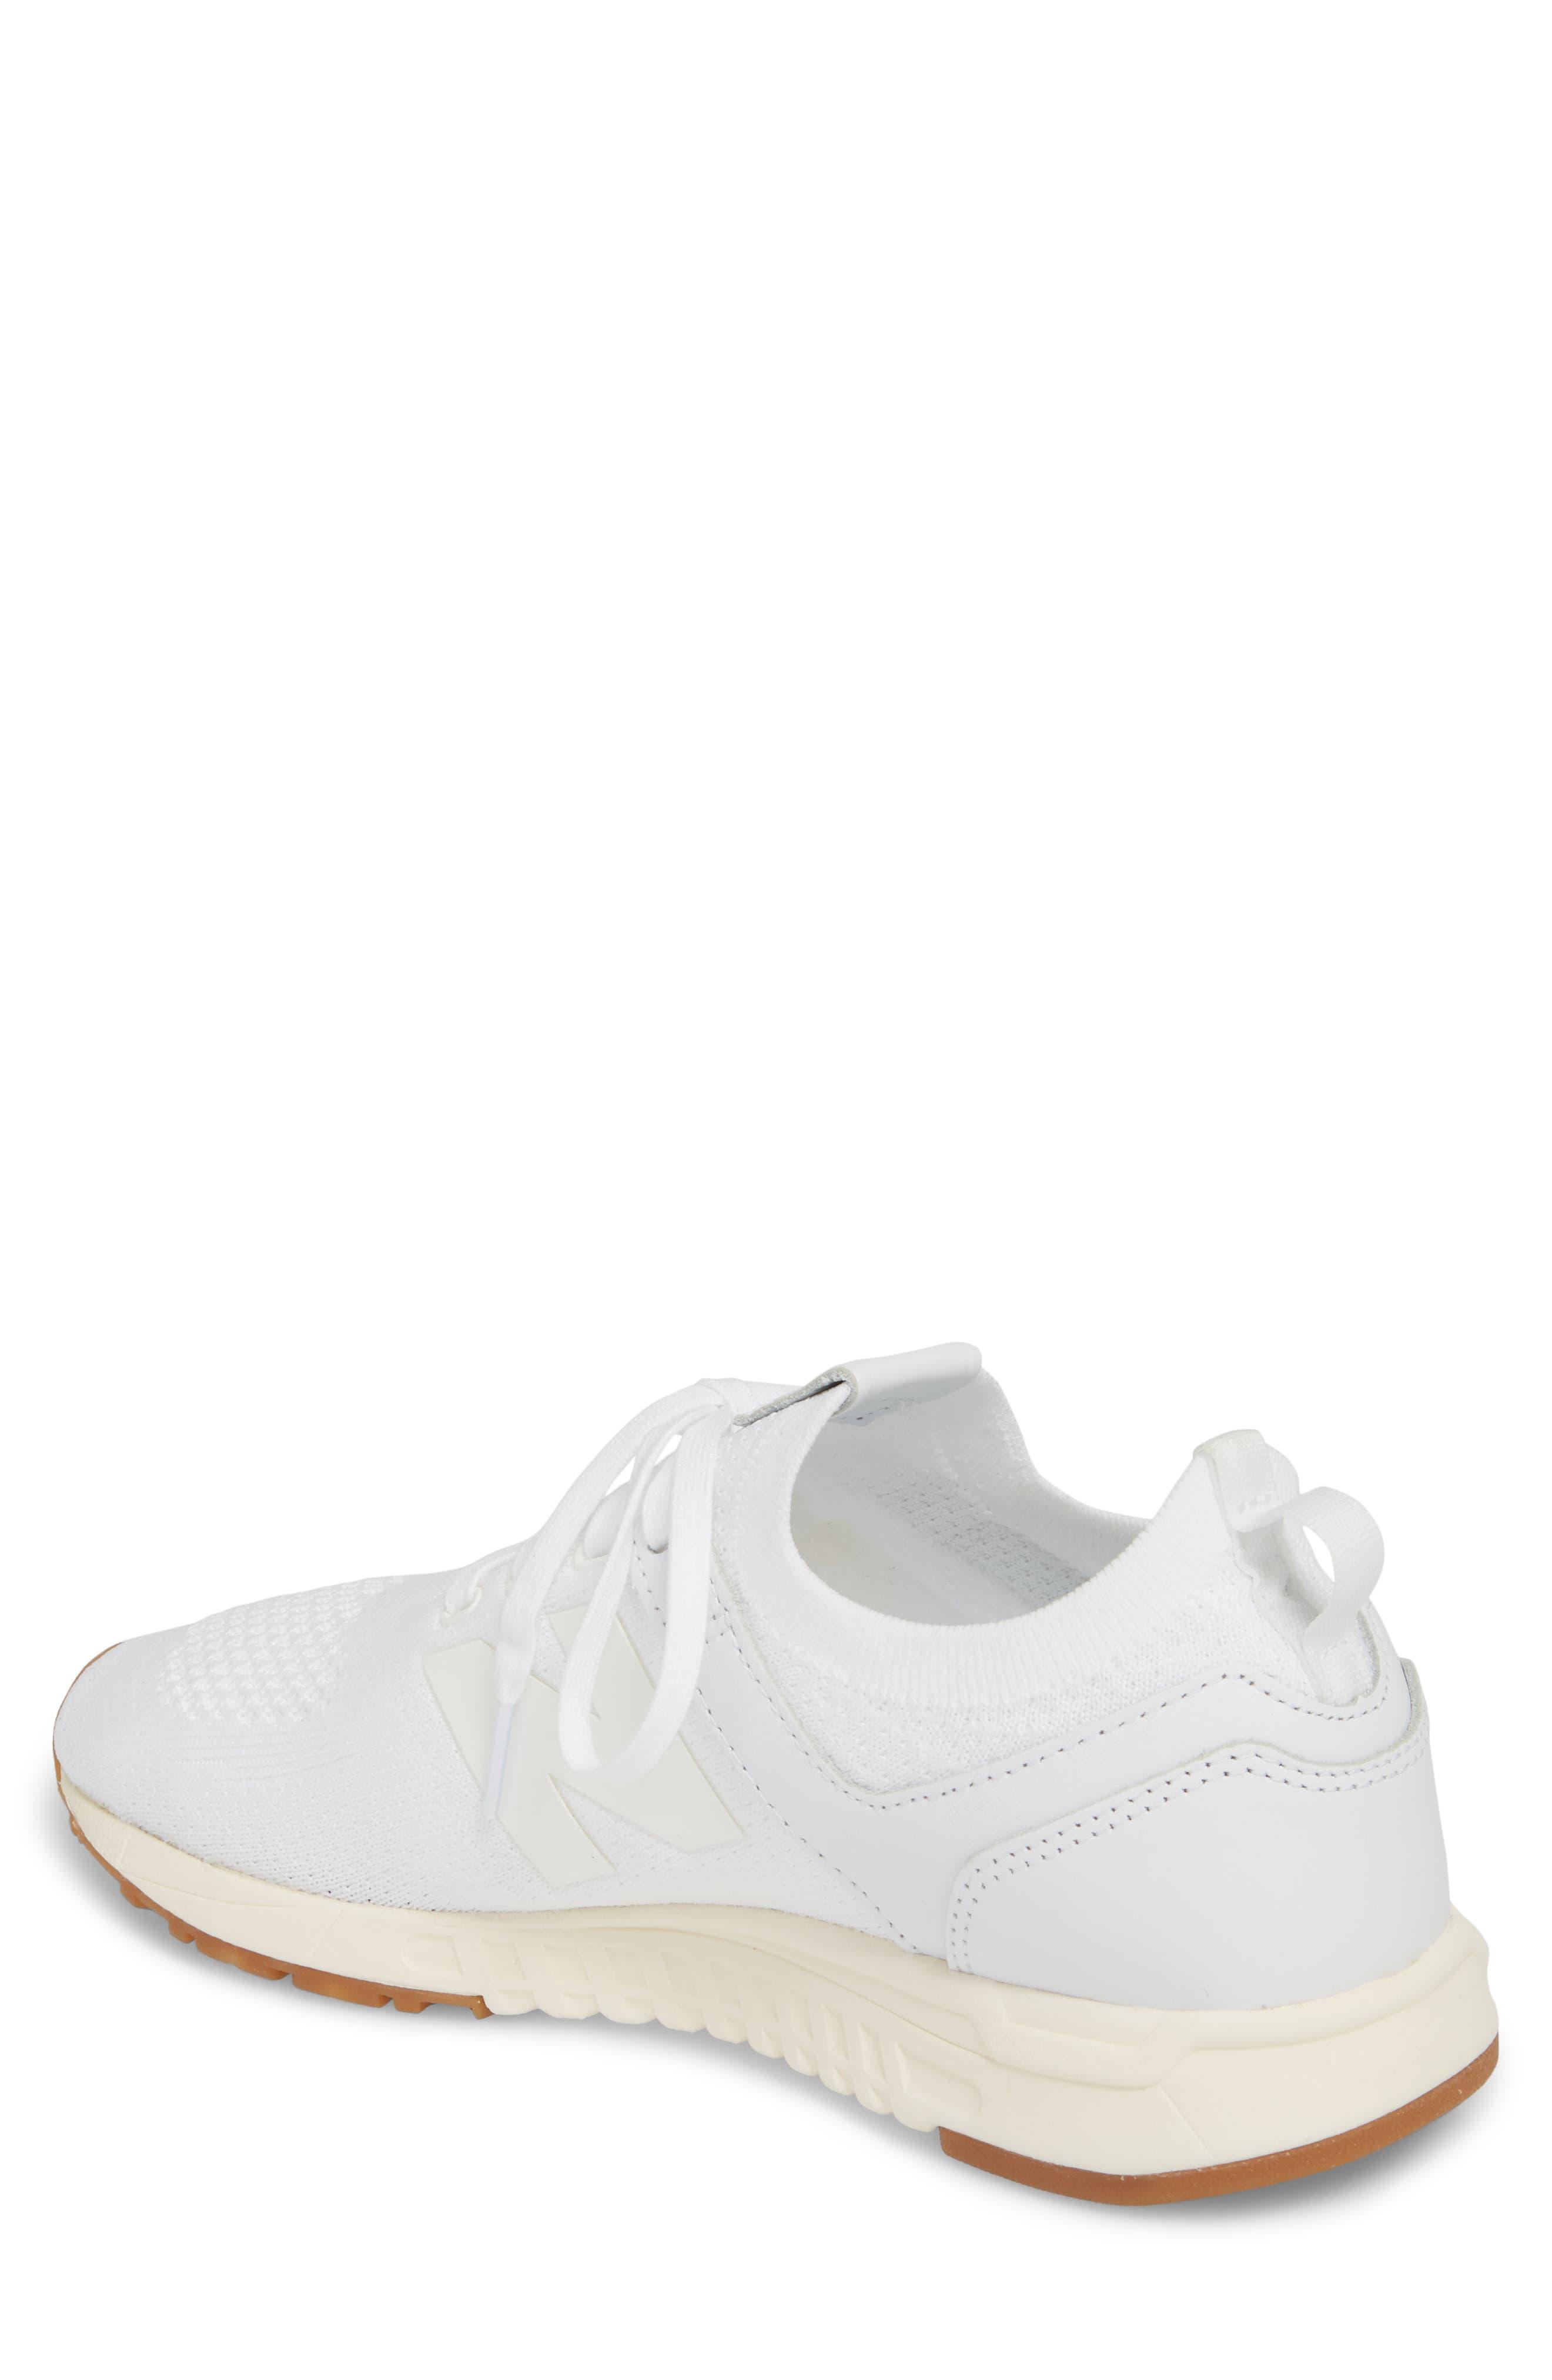 Alternate Image 2  - New Balance 247 Decon Knit Sneaker (Men)